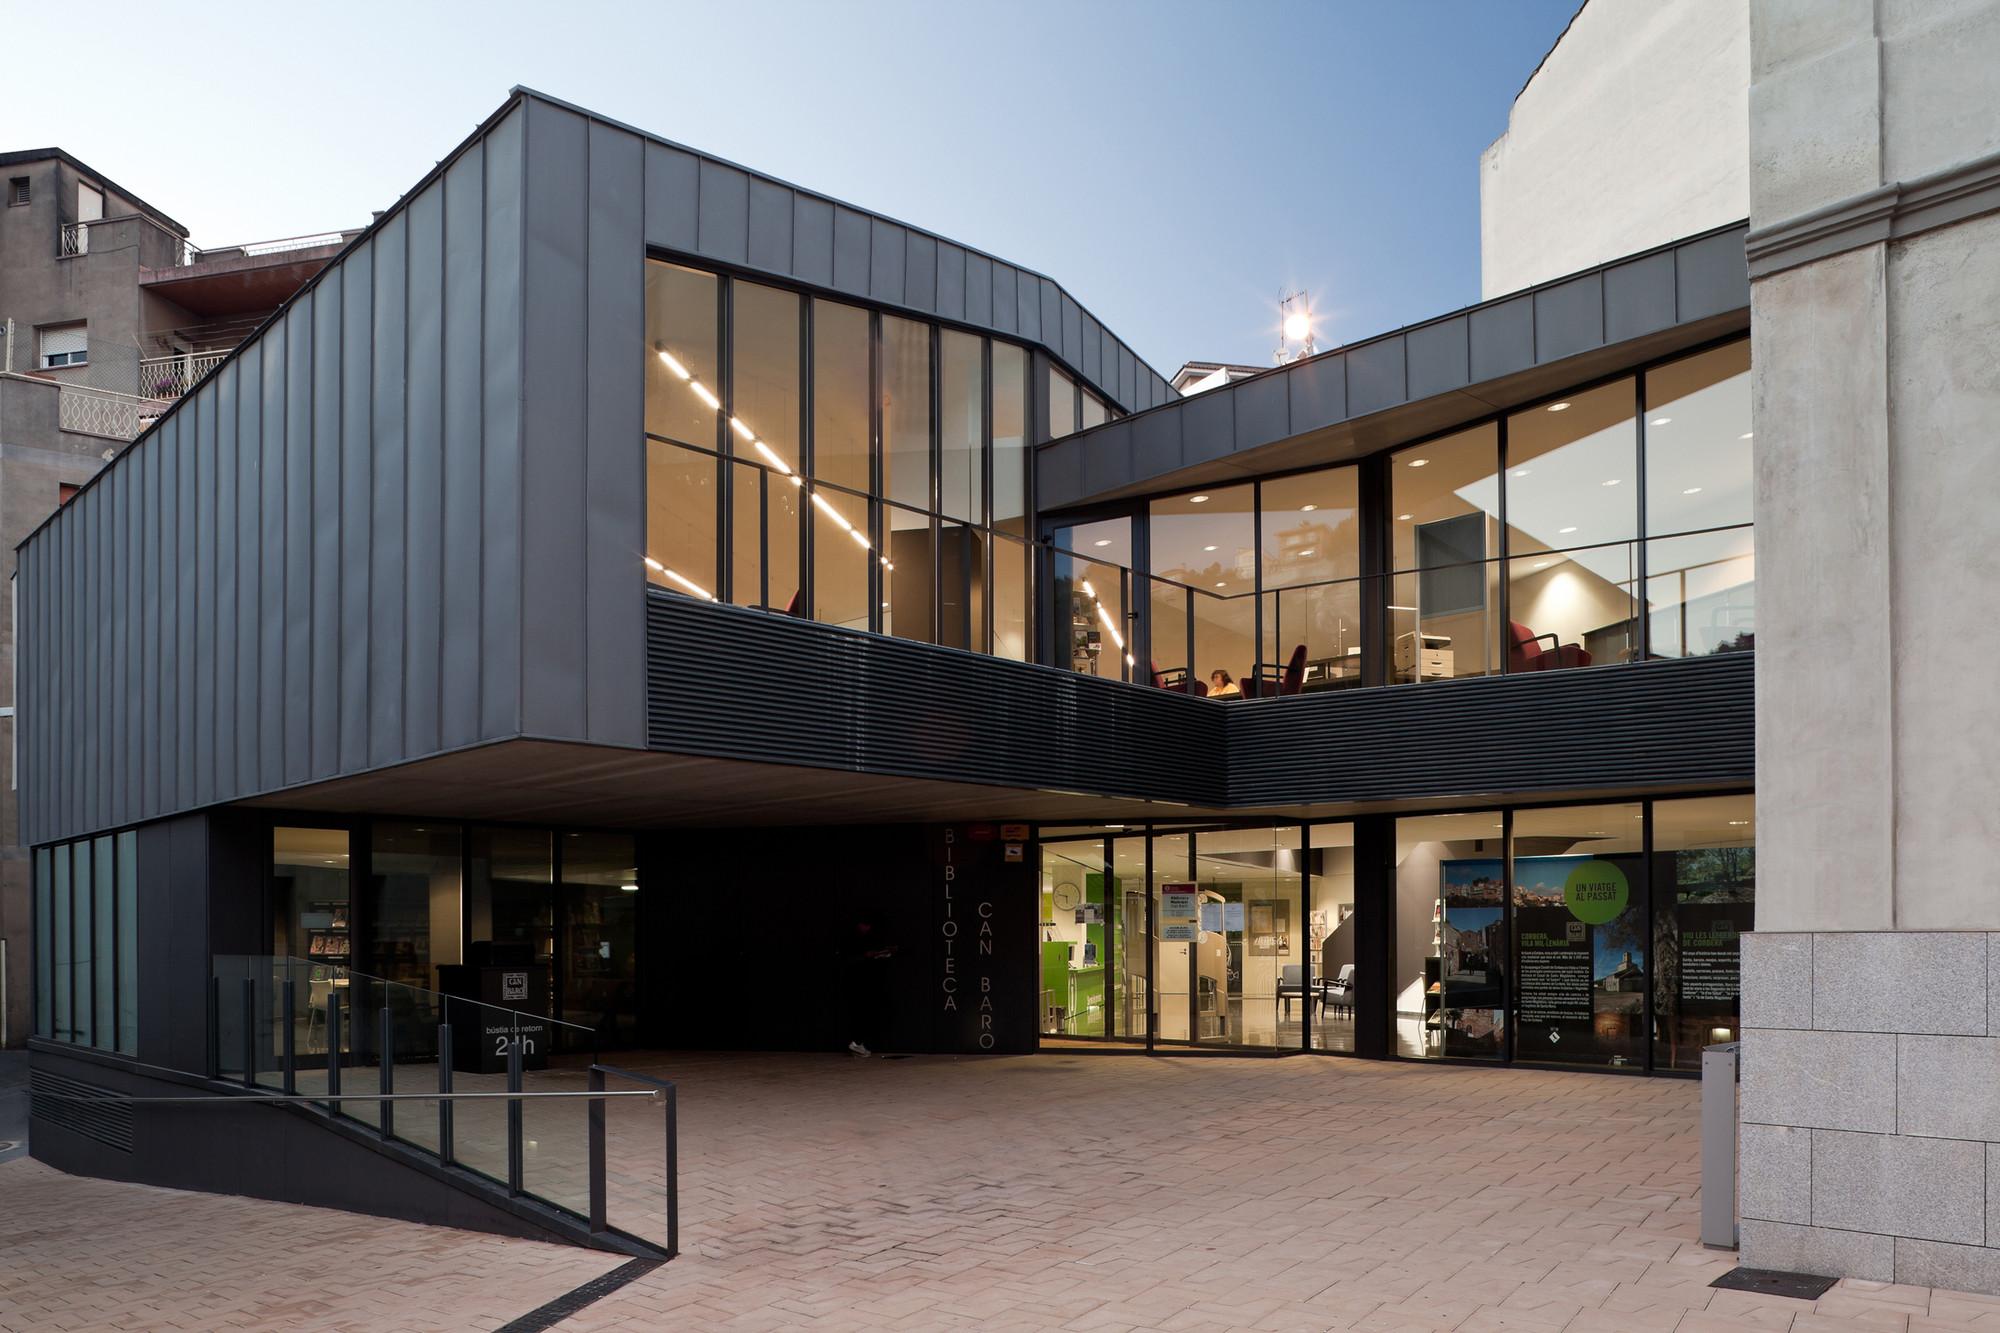 Biblioteca Can Baró / Sierra Rozas Arquitectes, © Jordi Bernadó